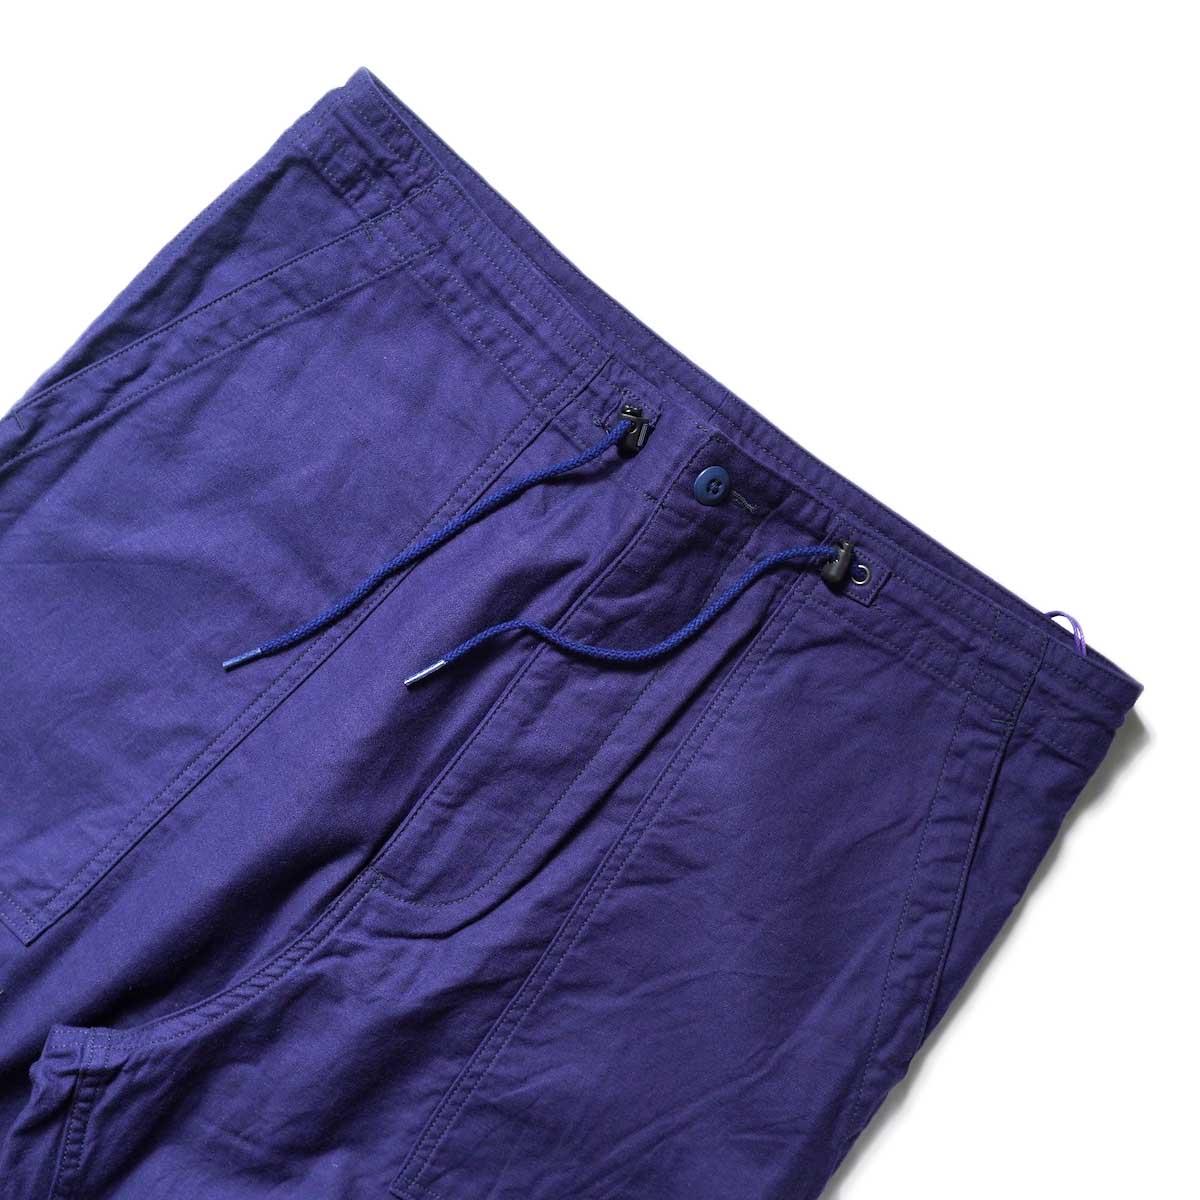 Needles / STRING FATIGUE PANT - BACK SATEEN (Navy)ウエスト